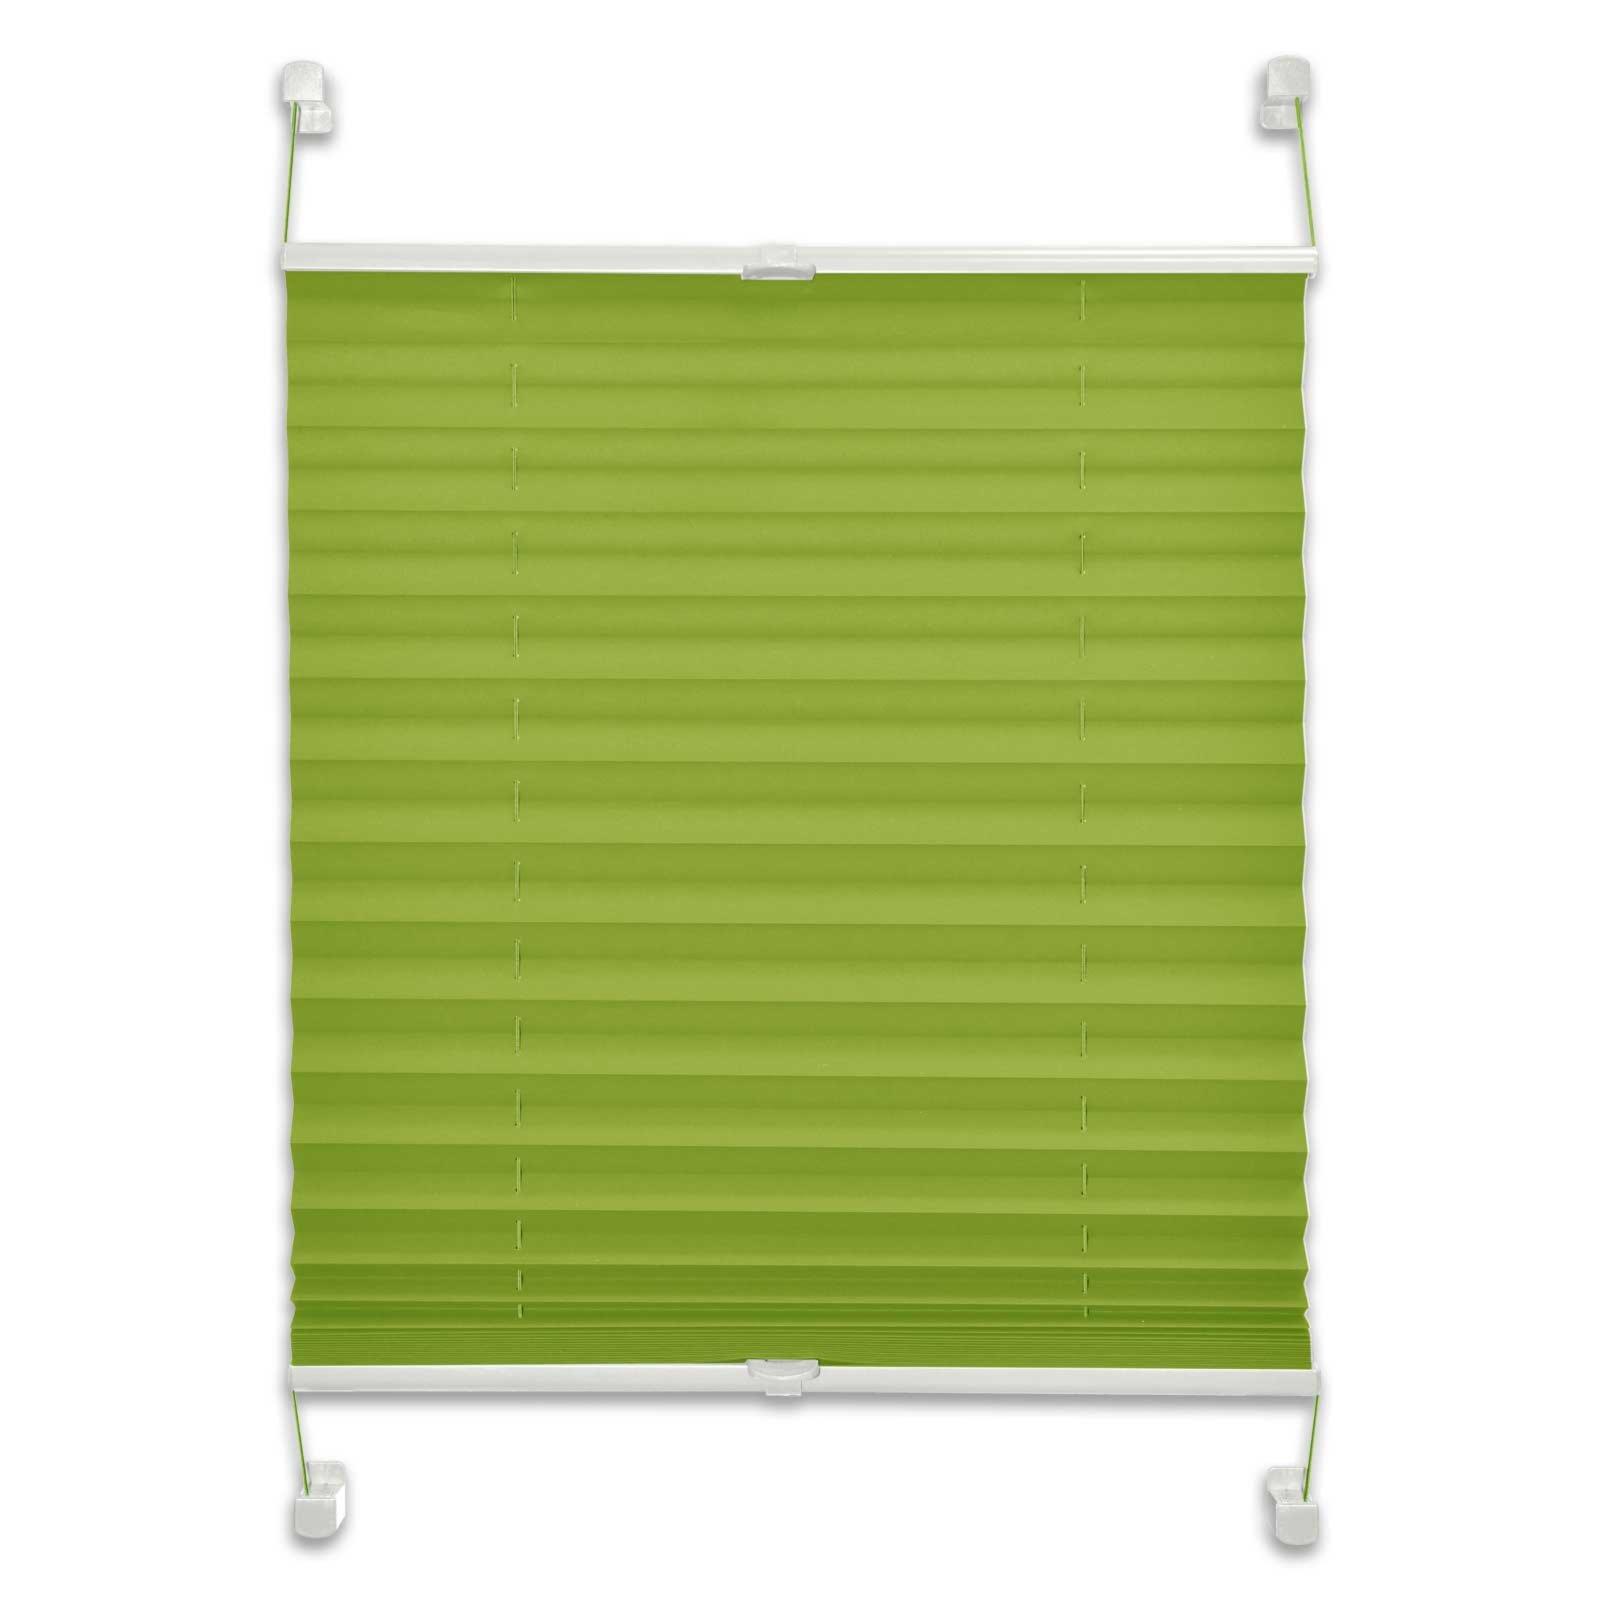 Plissee - blickdicht - grün - 60x130 cm